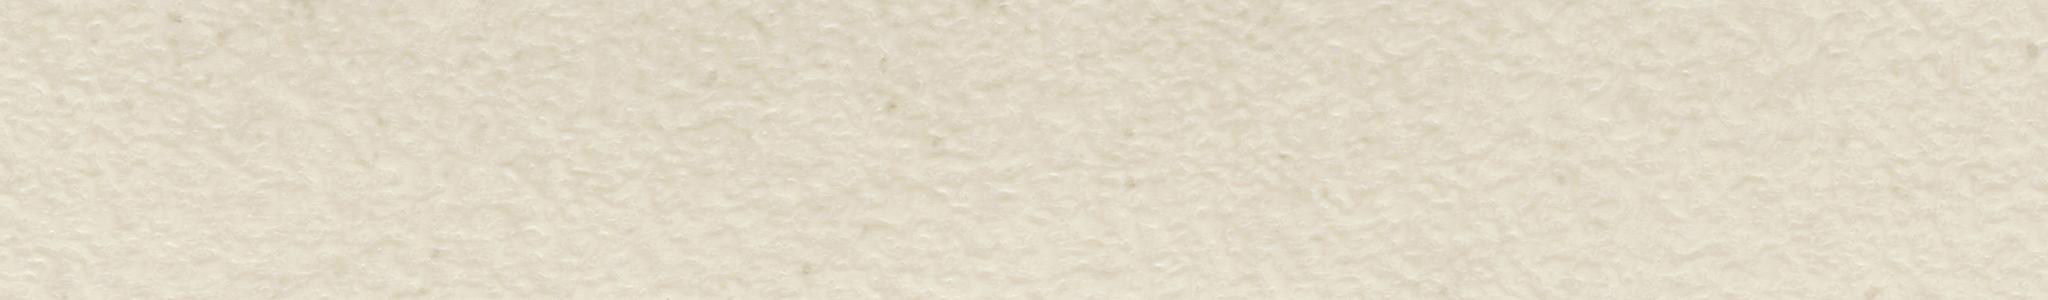 HD 297981 ABS hrana Sahara